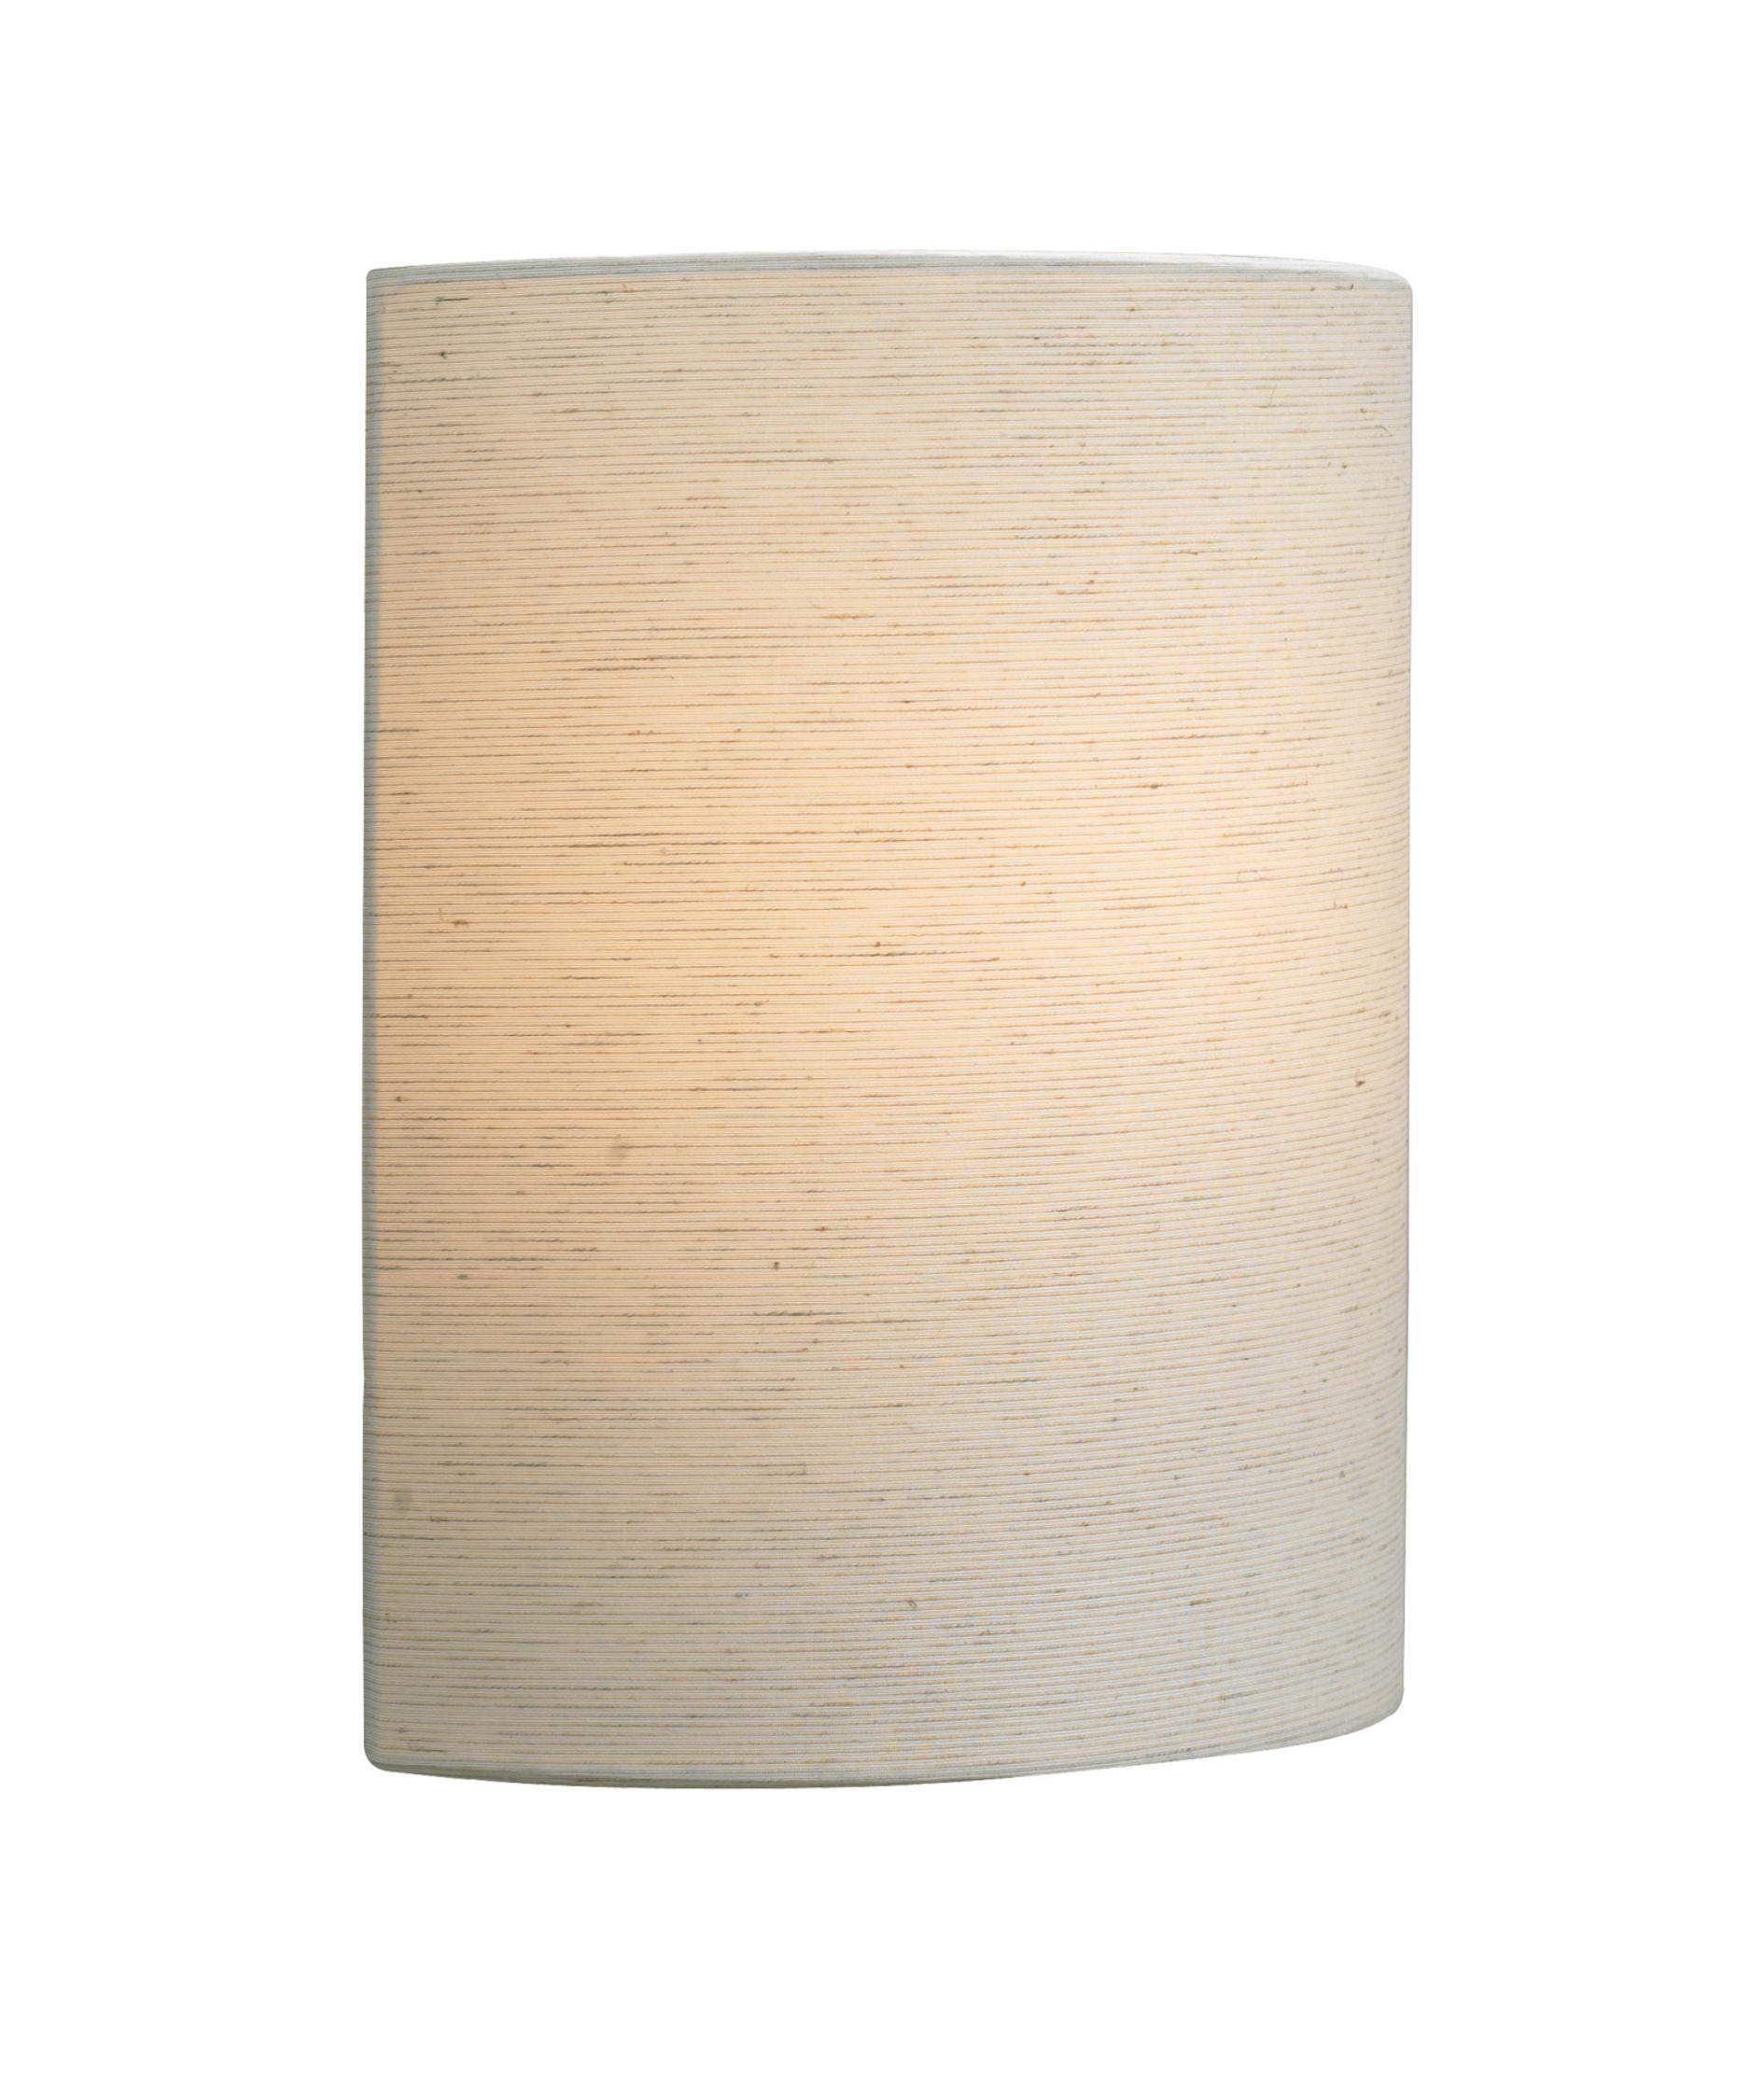 Lbl lighting jw fiona inch wall sconce capitol lighting